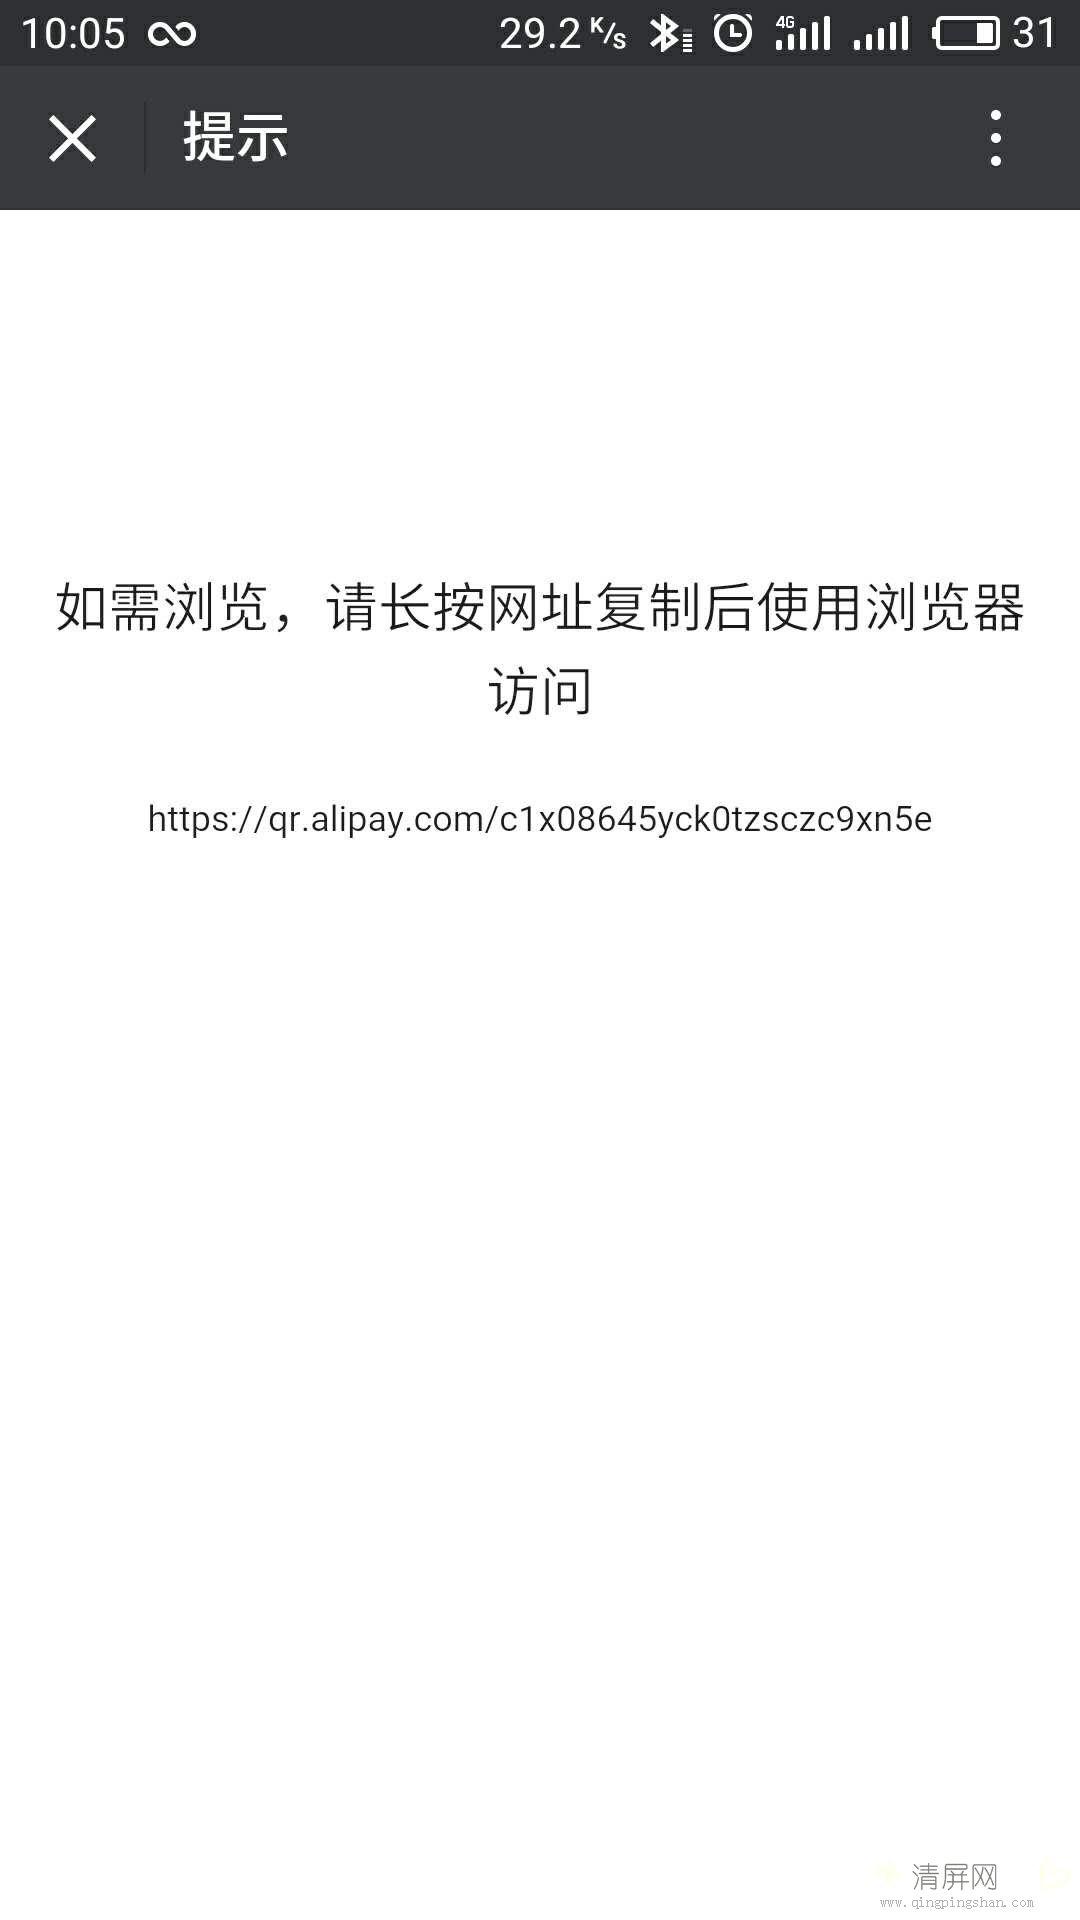 droidyue_alipay_hongbao_issue.jpeg